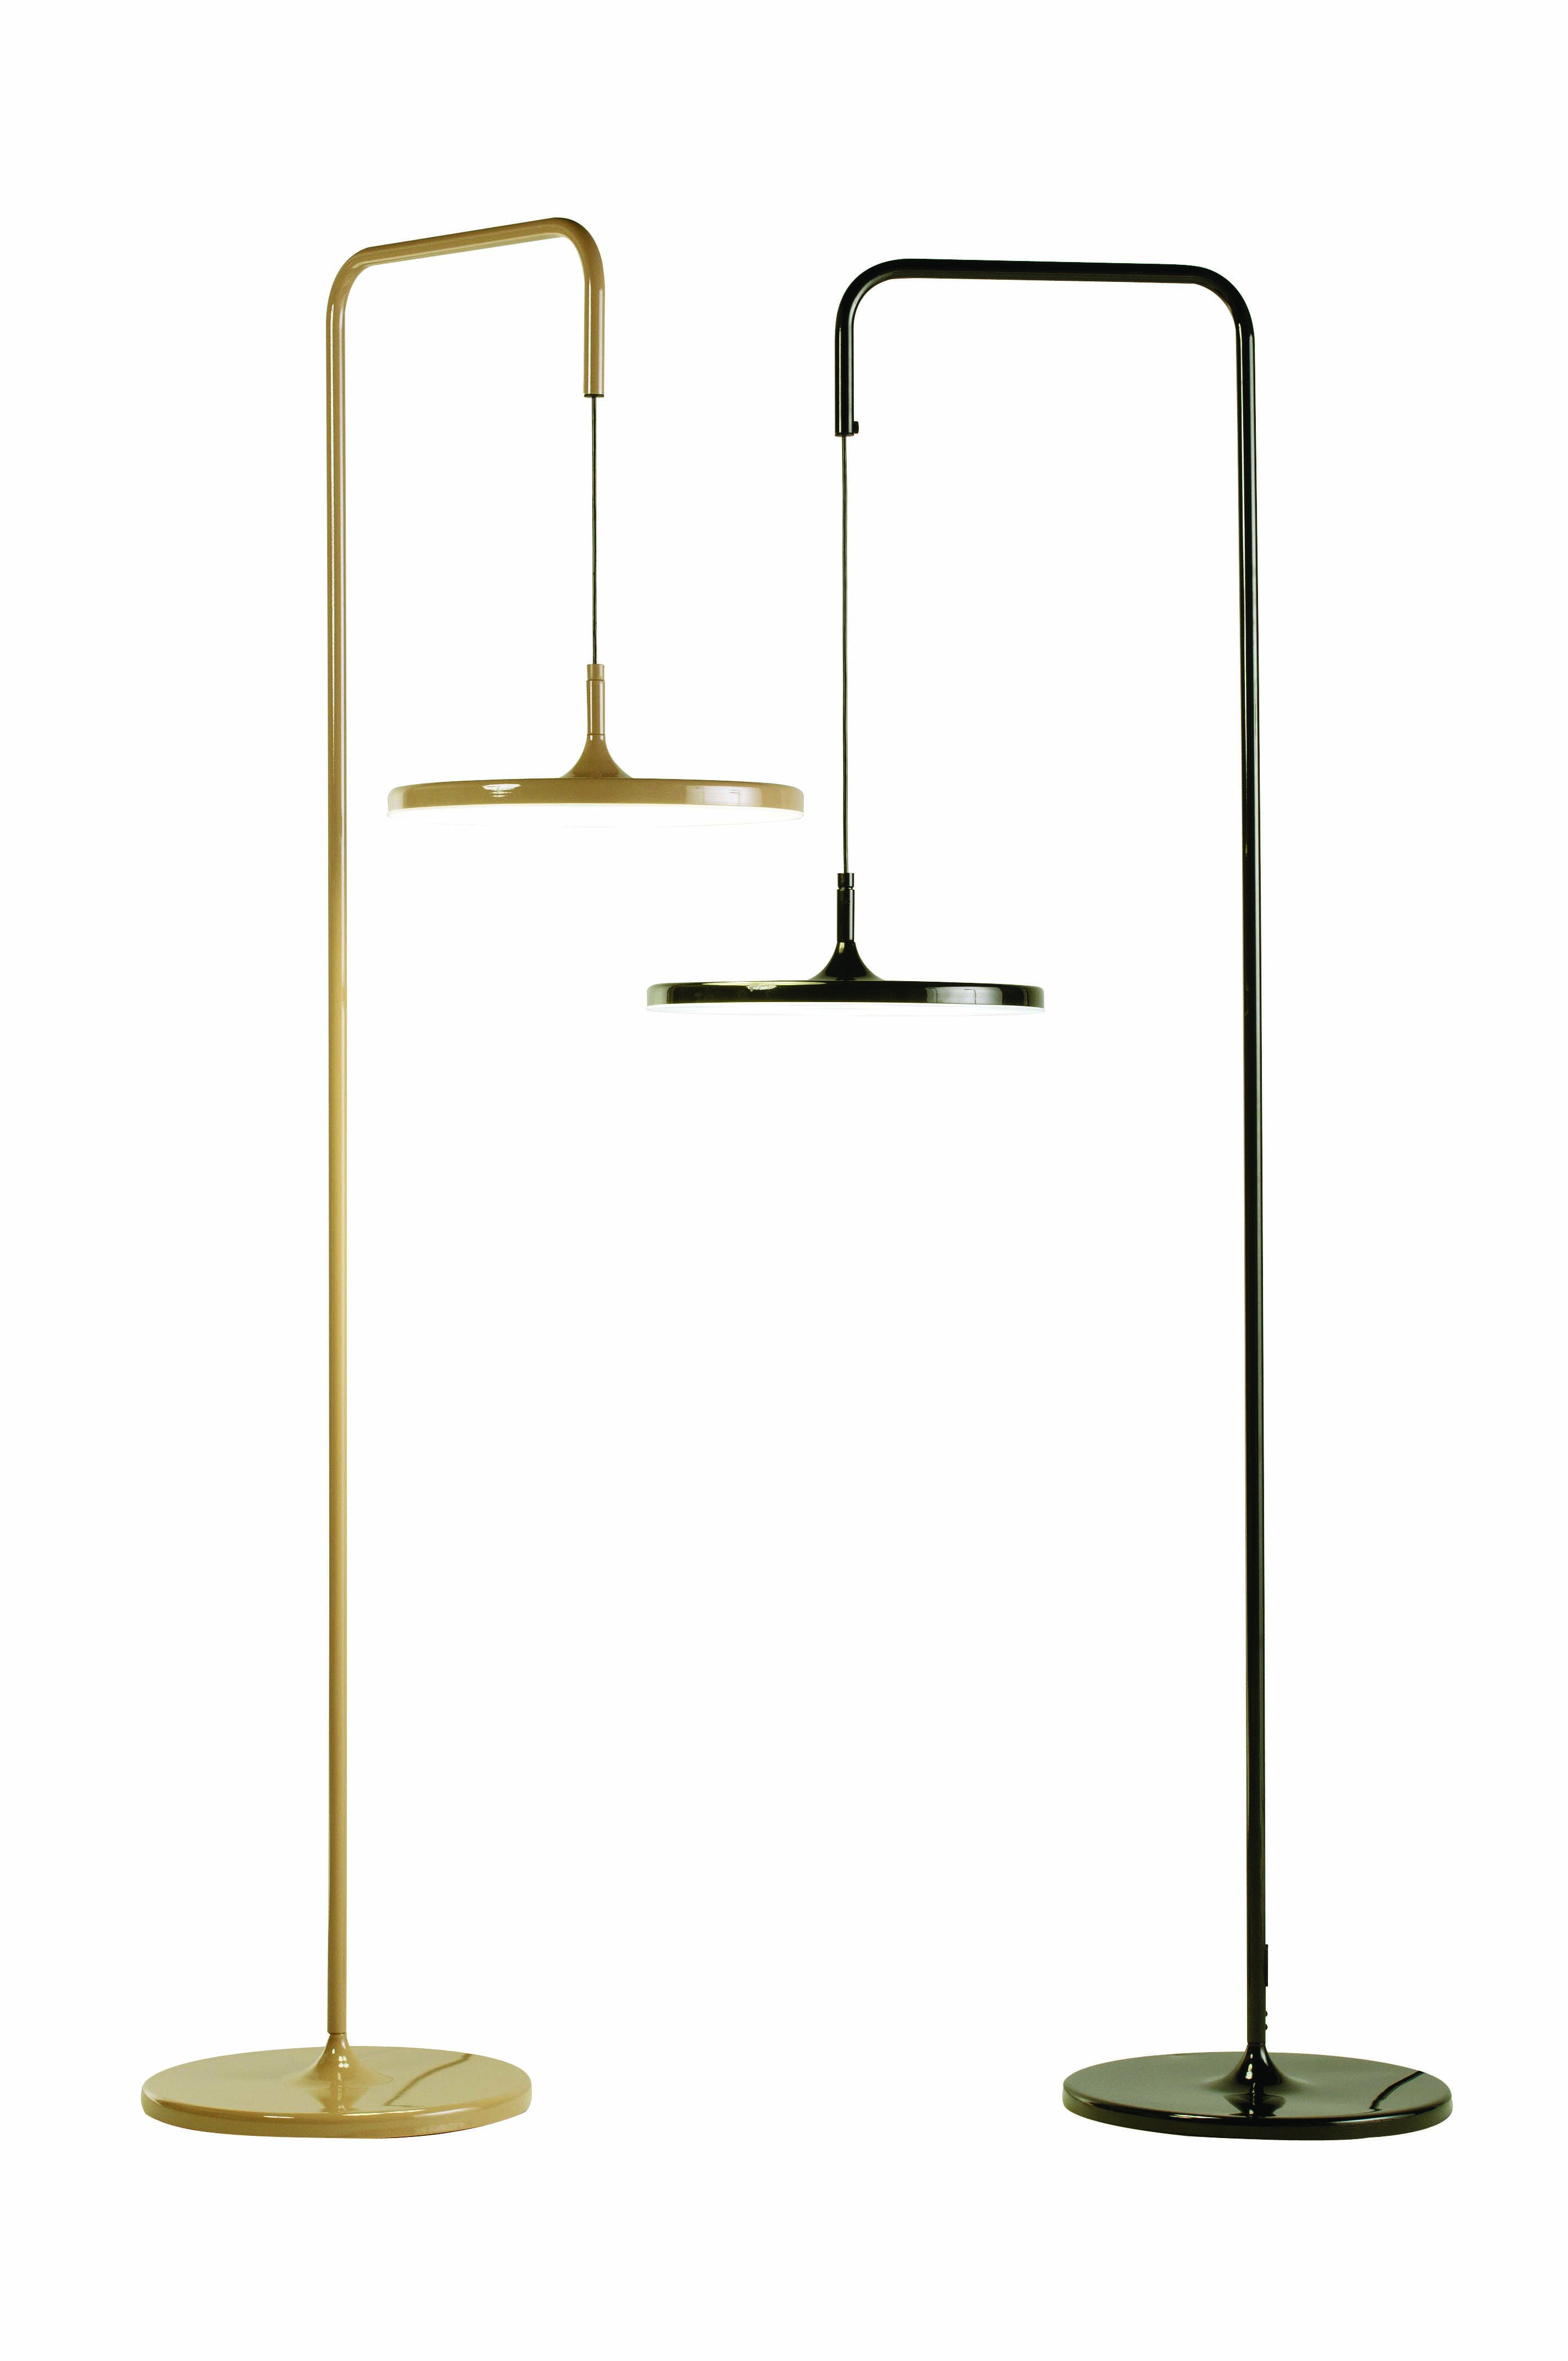 Roche Bobois Yoyo Angled Floor Lamp Design Hitoshi